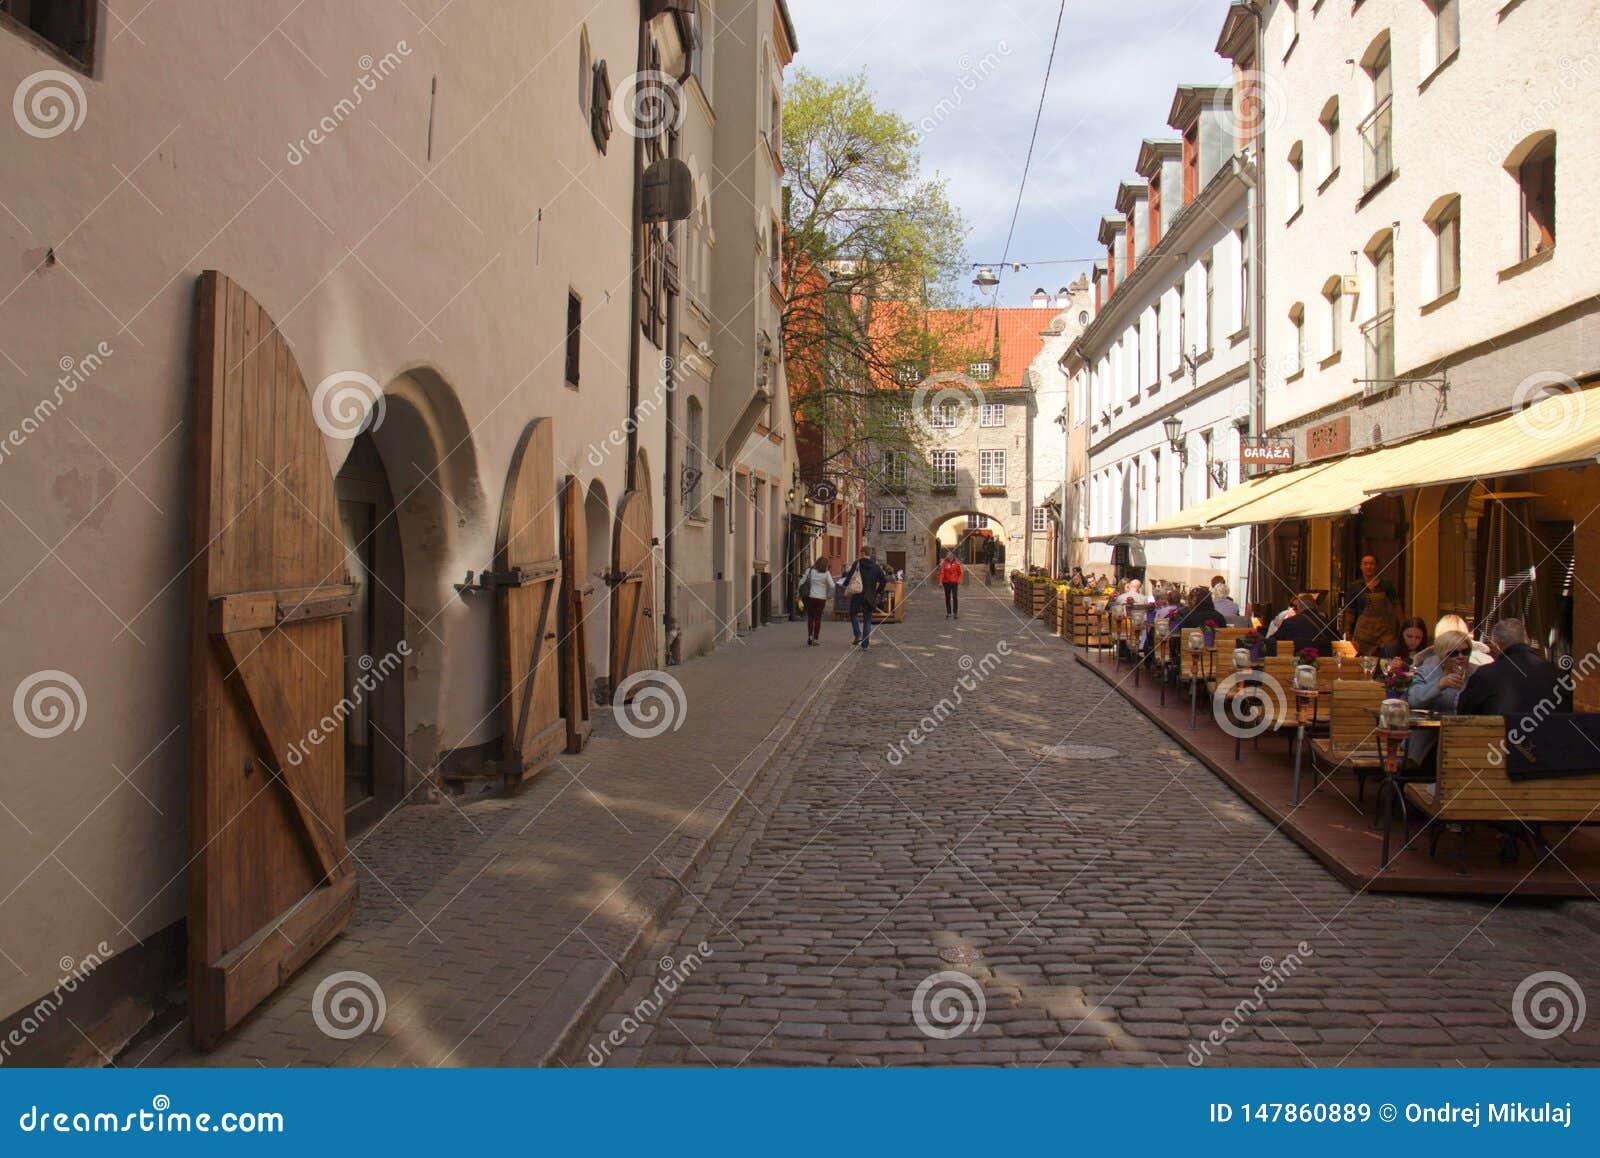 Riga old town street. Architecture in Riga. Latvia